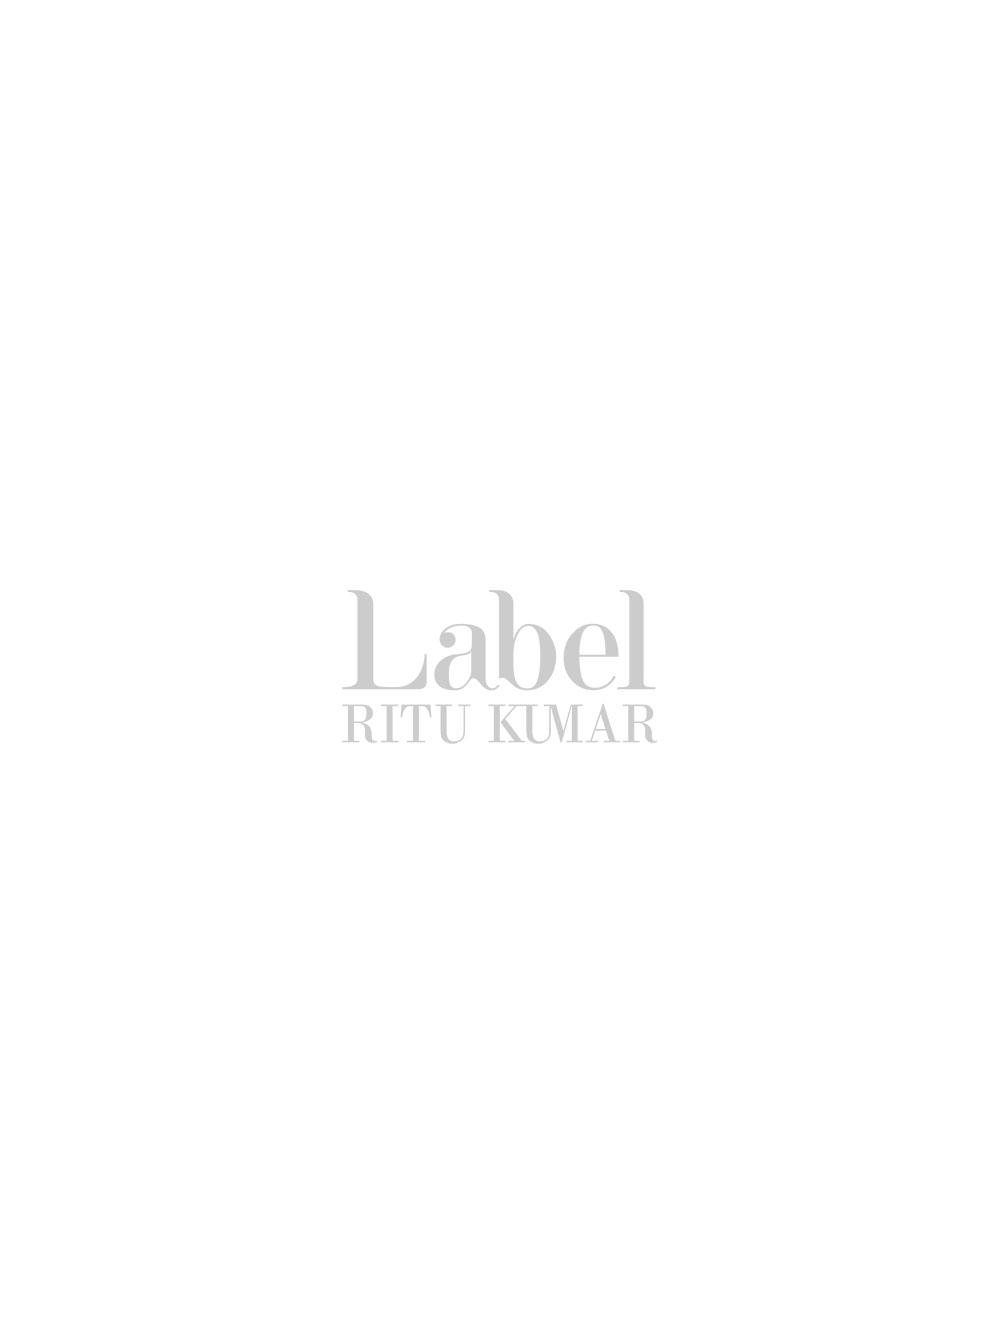 Peach Shifly Print Tunic  by label ritu kumar